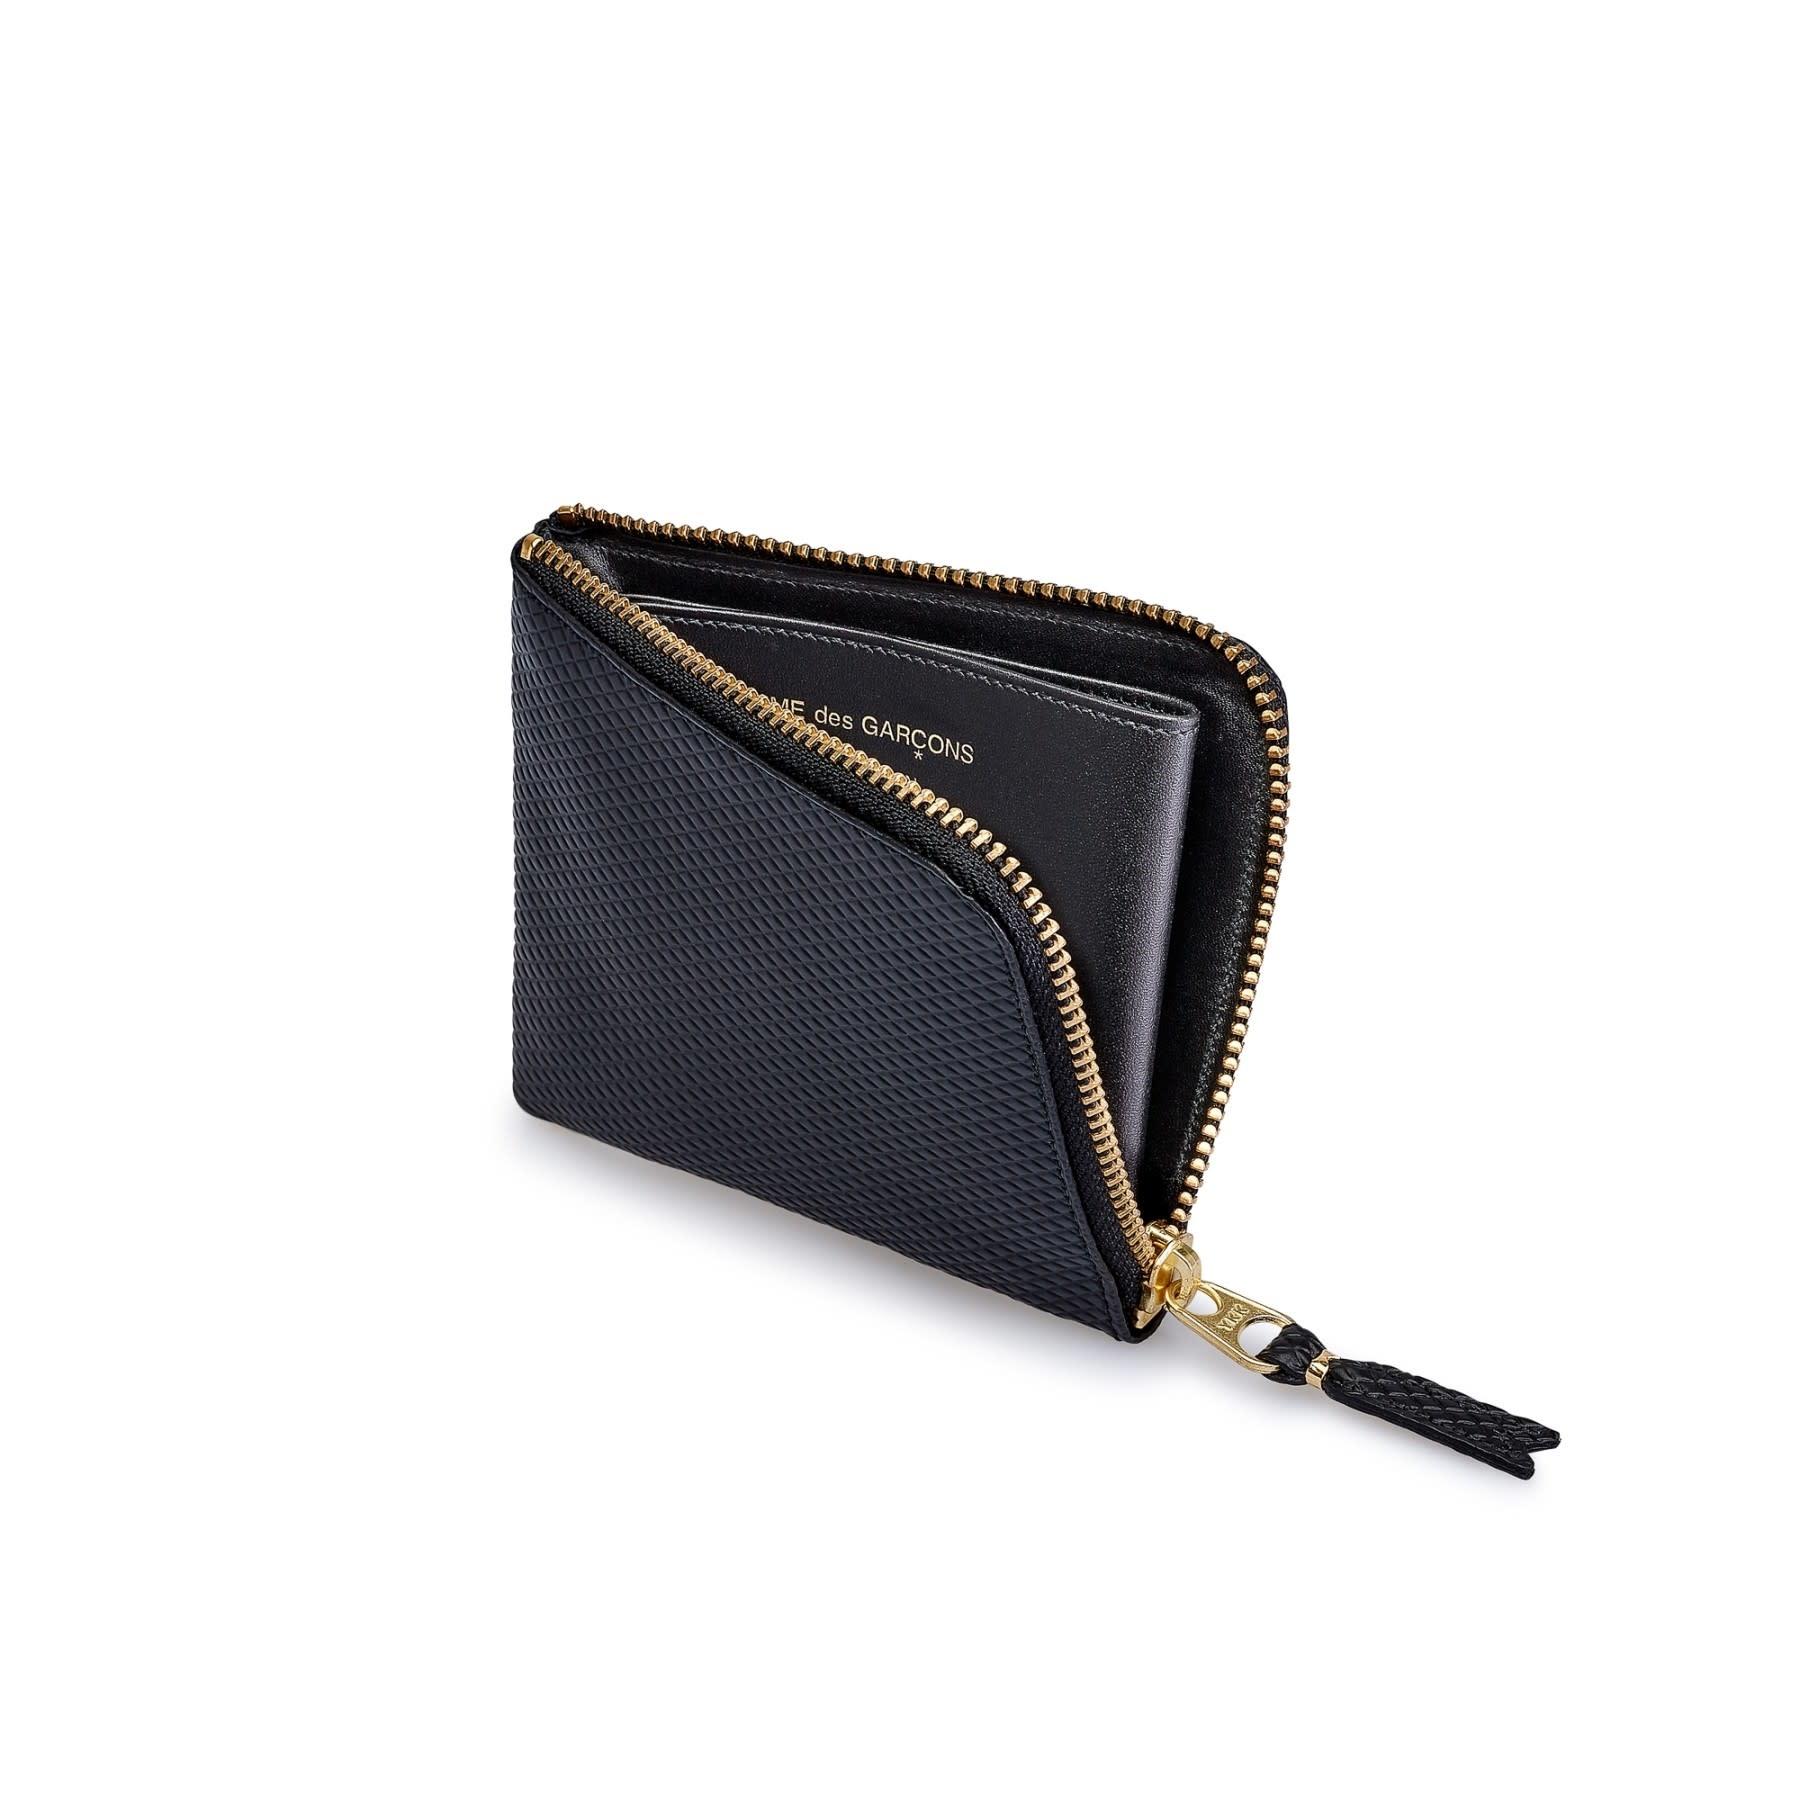 COMME des GARÇONS Wallet Half ZIP WALLET Lux BLACK SA3100 LG